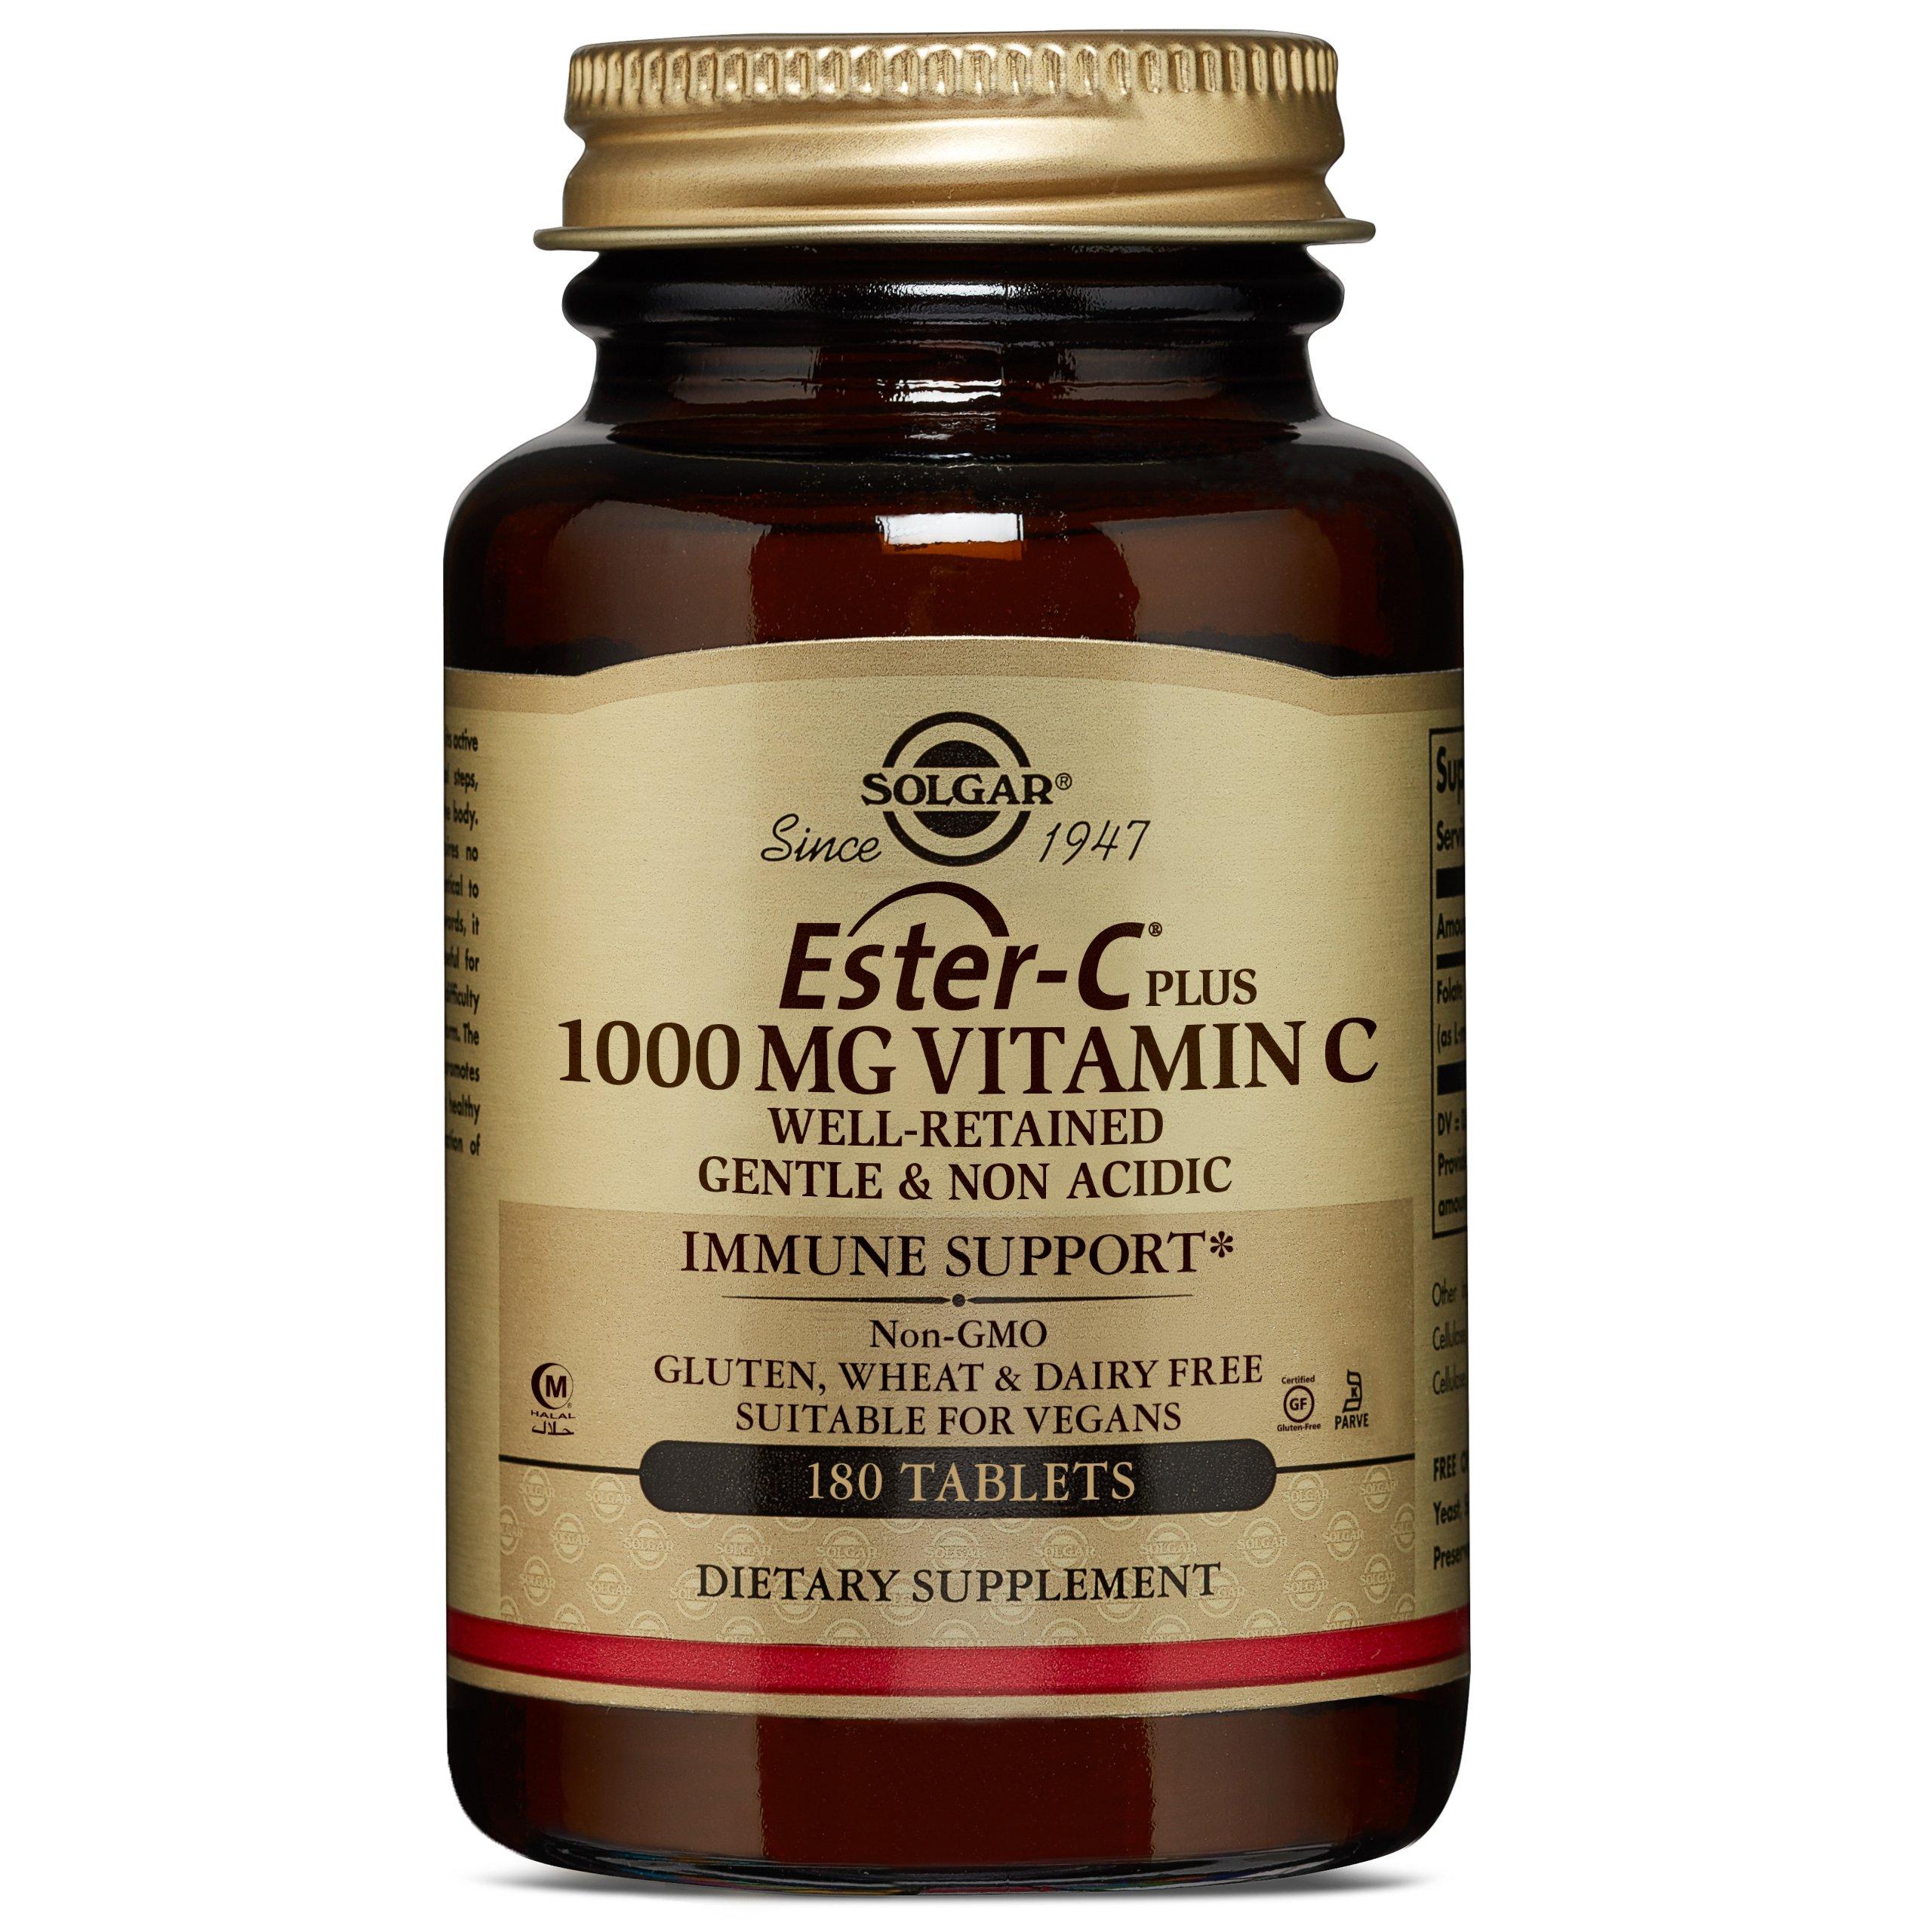 Solgar Ester-C® Plus 1000 mg Vitamin C, Immune Support, Well-Retained, Gentle & Non Acidic, Non-GMO, Suitable for Vegans, 180 Tablets